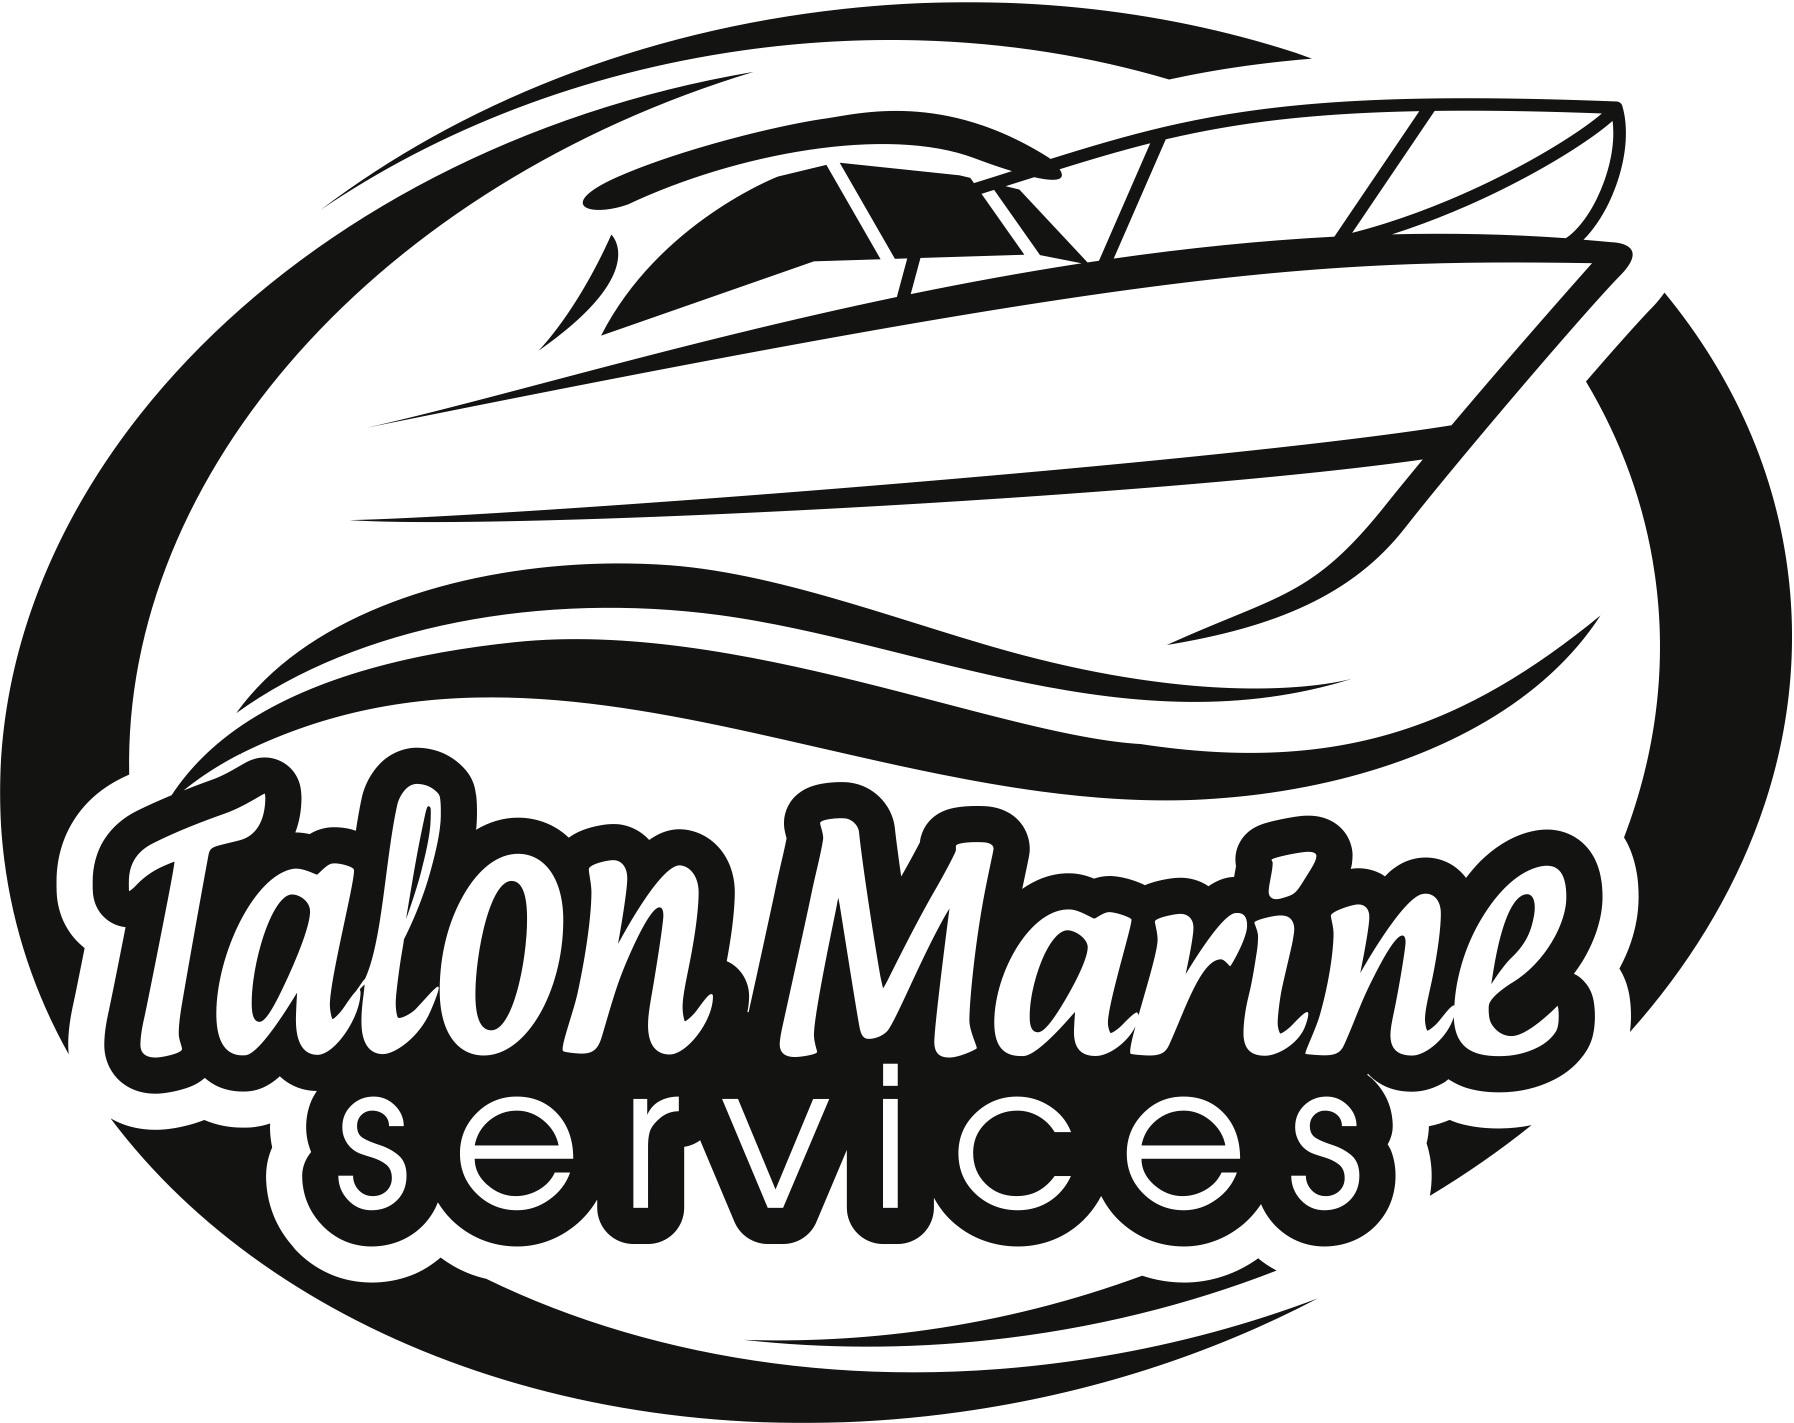 LOGO_Talon Marine Services